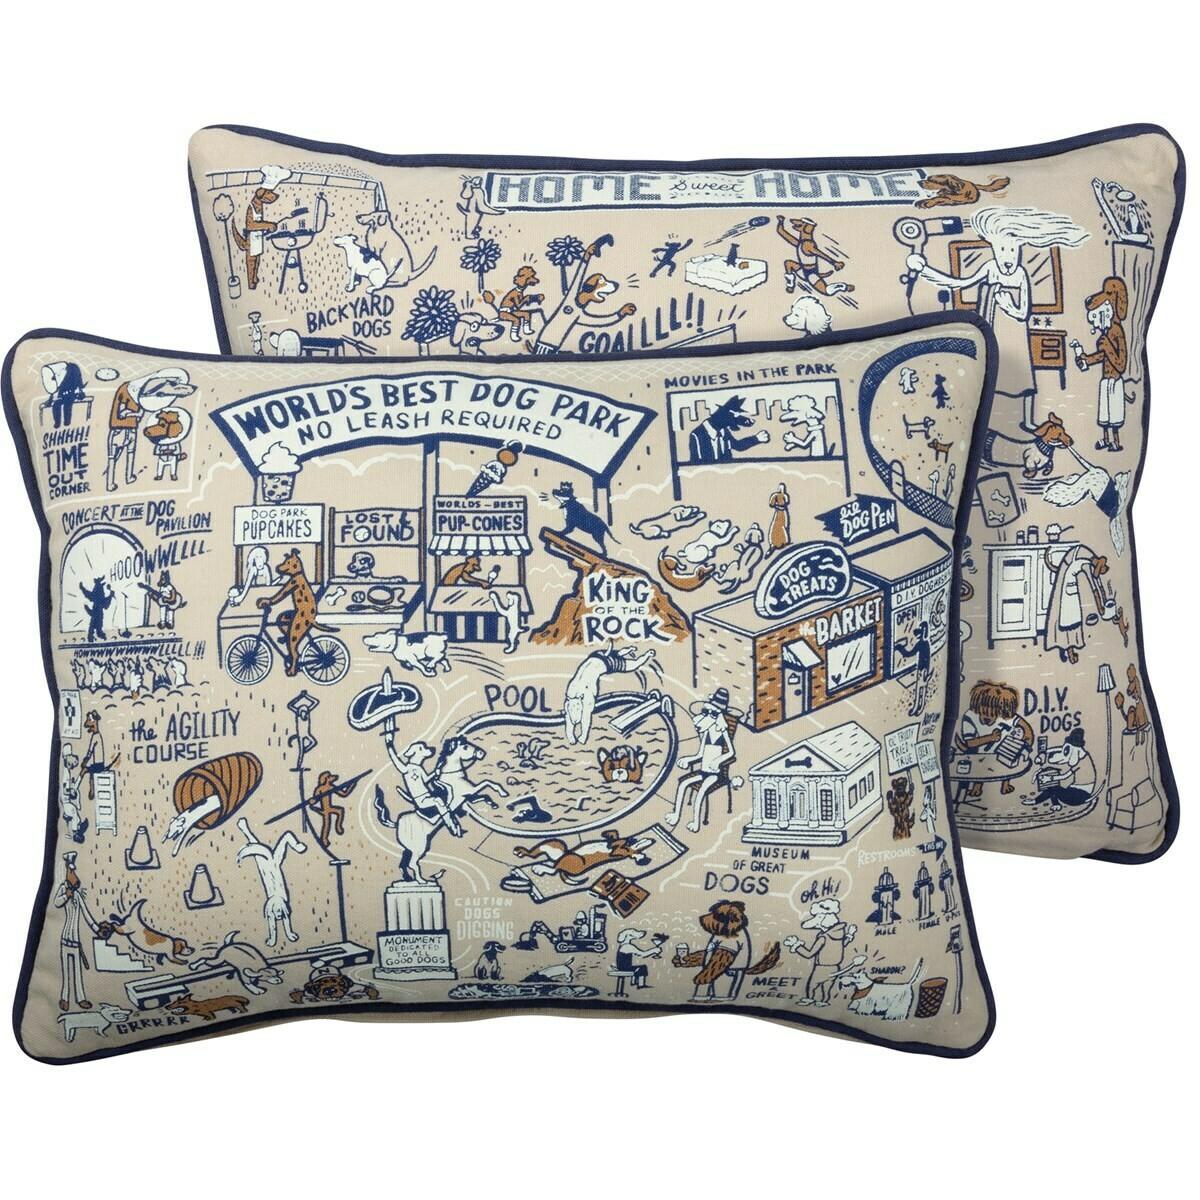 Reversible Retro Art Pillows (Dog Park & Catsville)